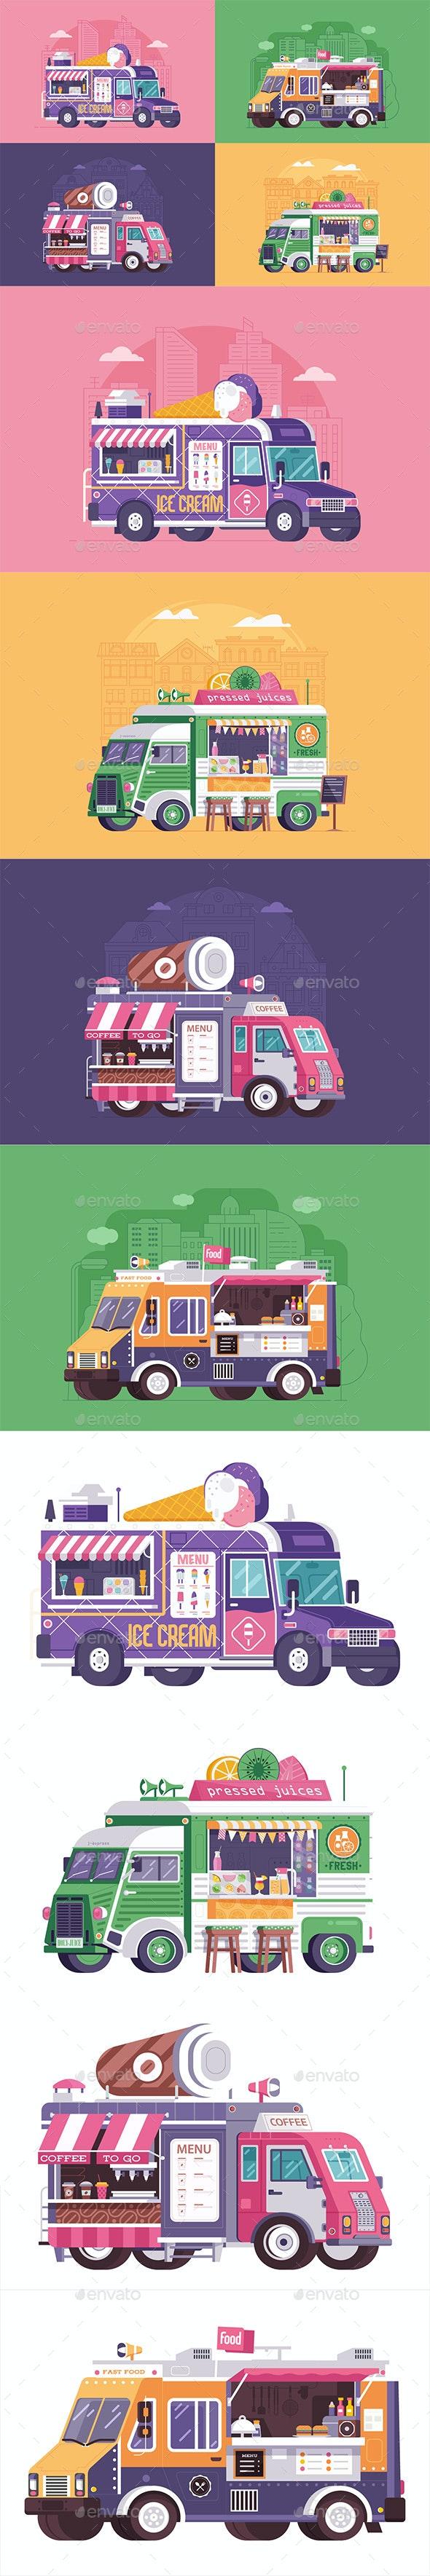 Street Food Trucks and Vans - Vectors